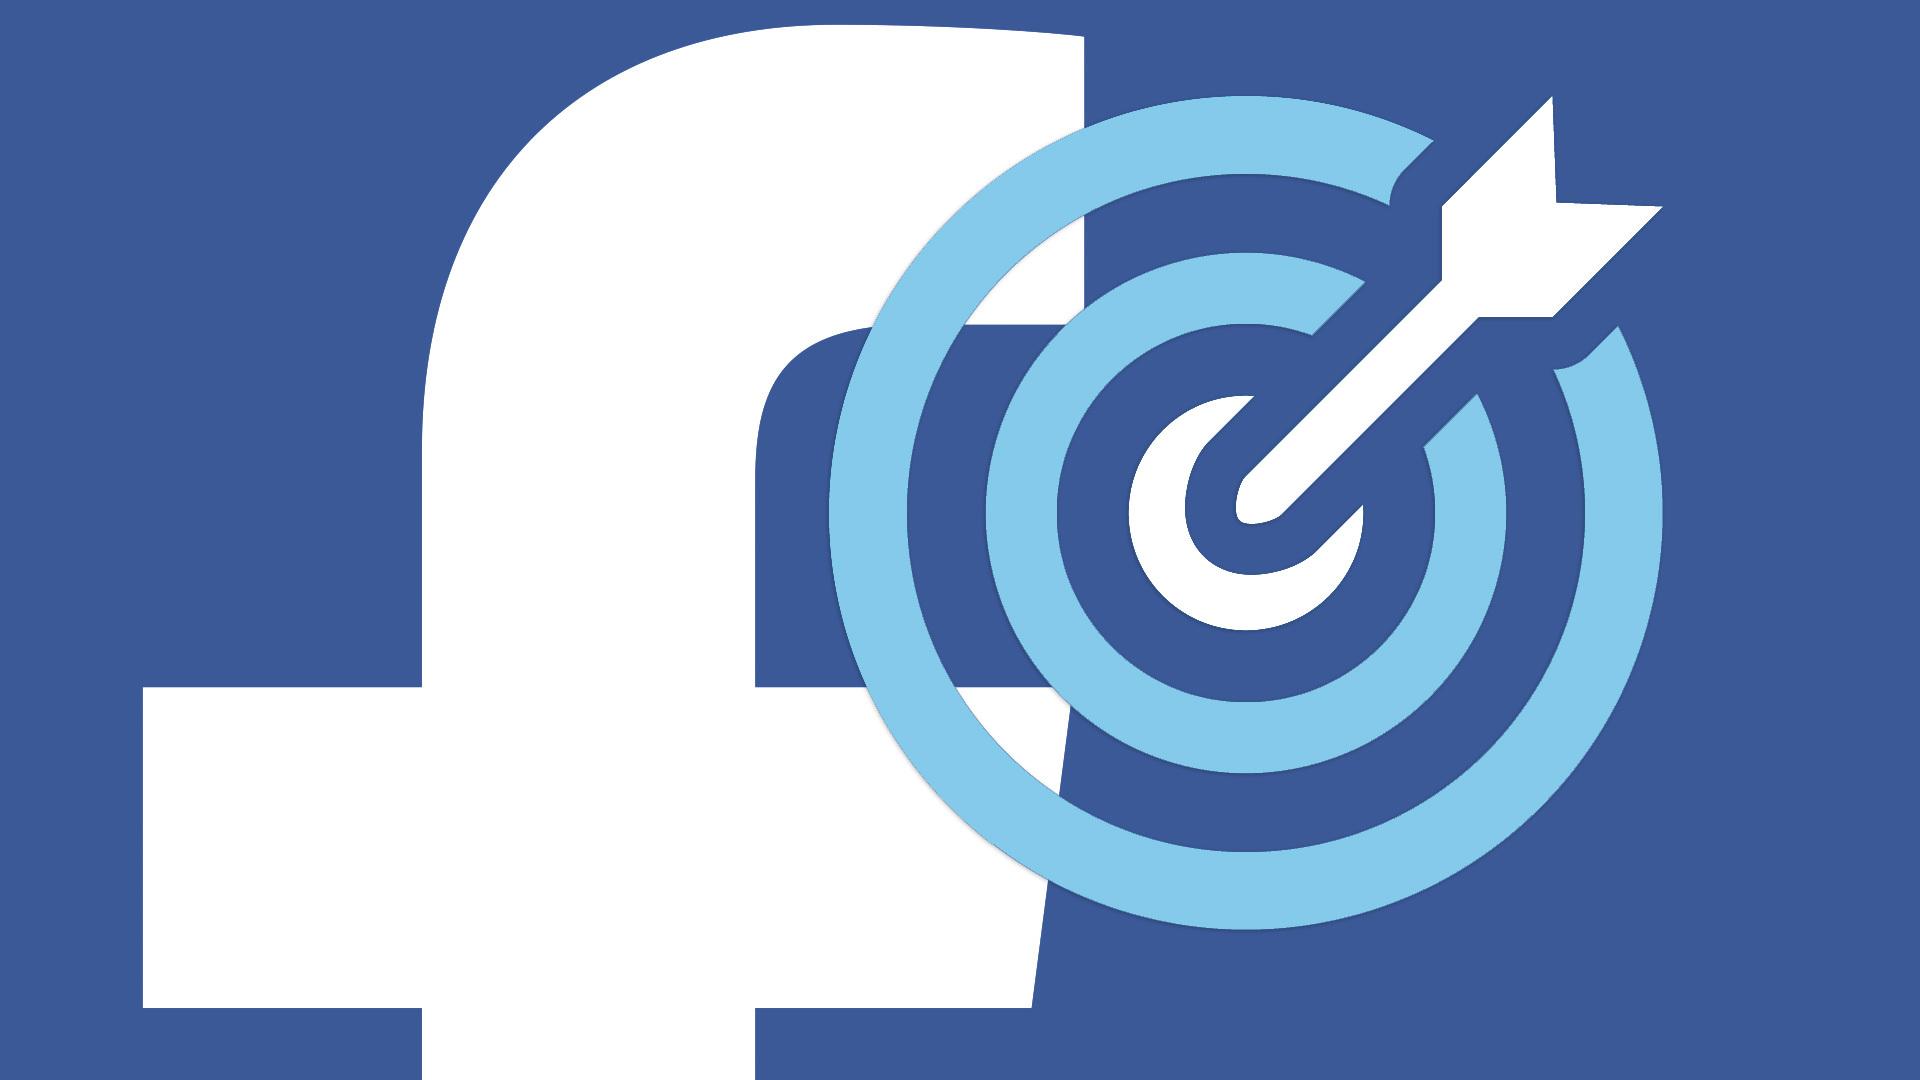 Facebook Full Hd